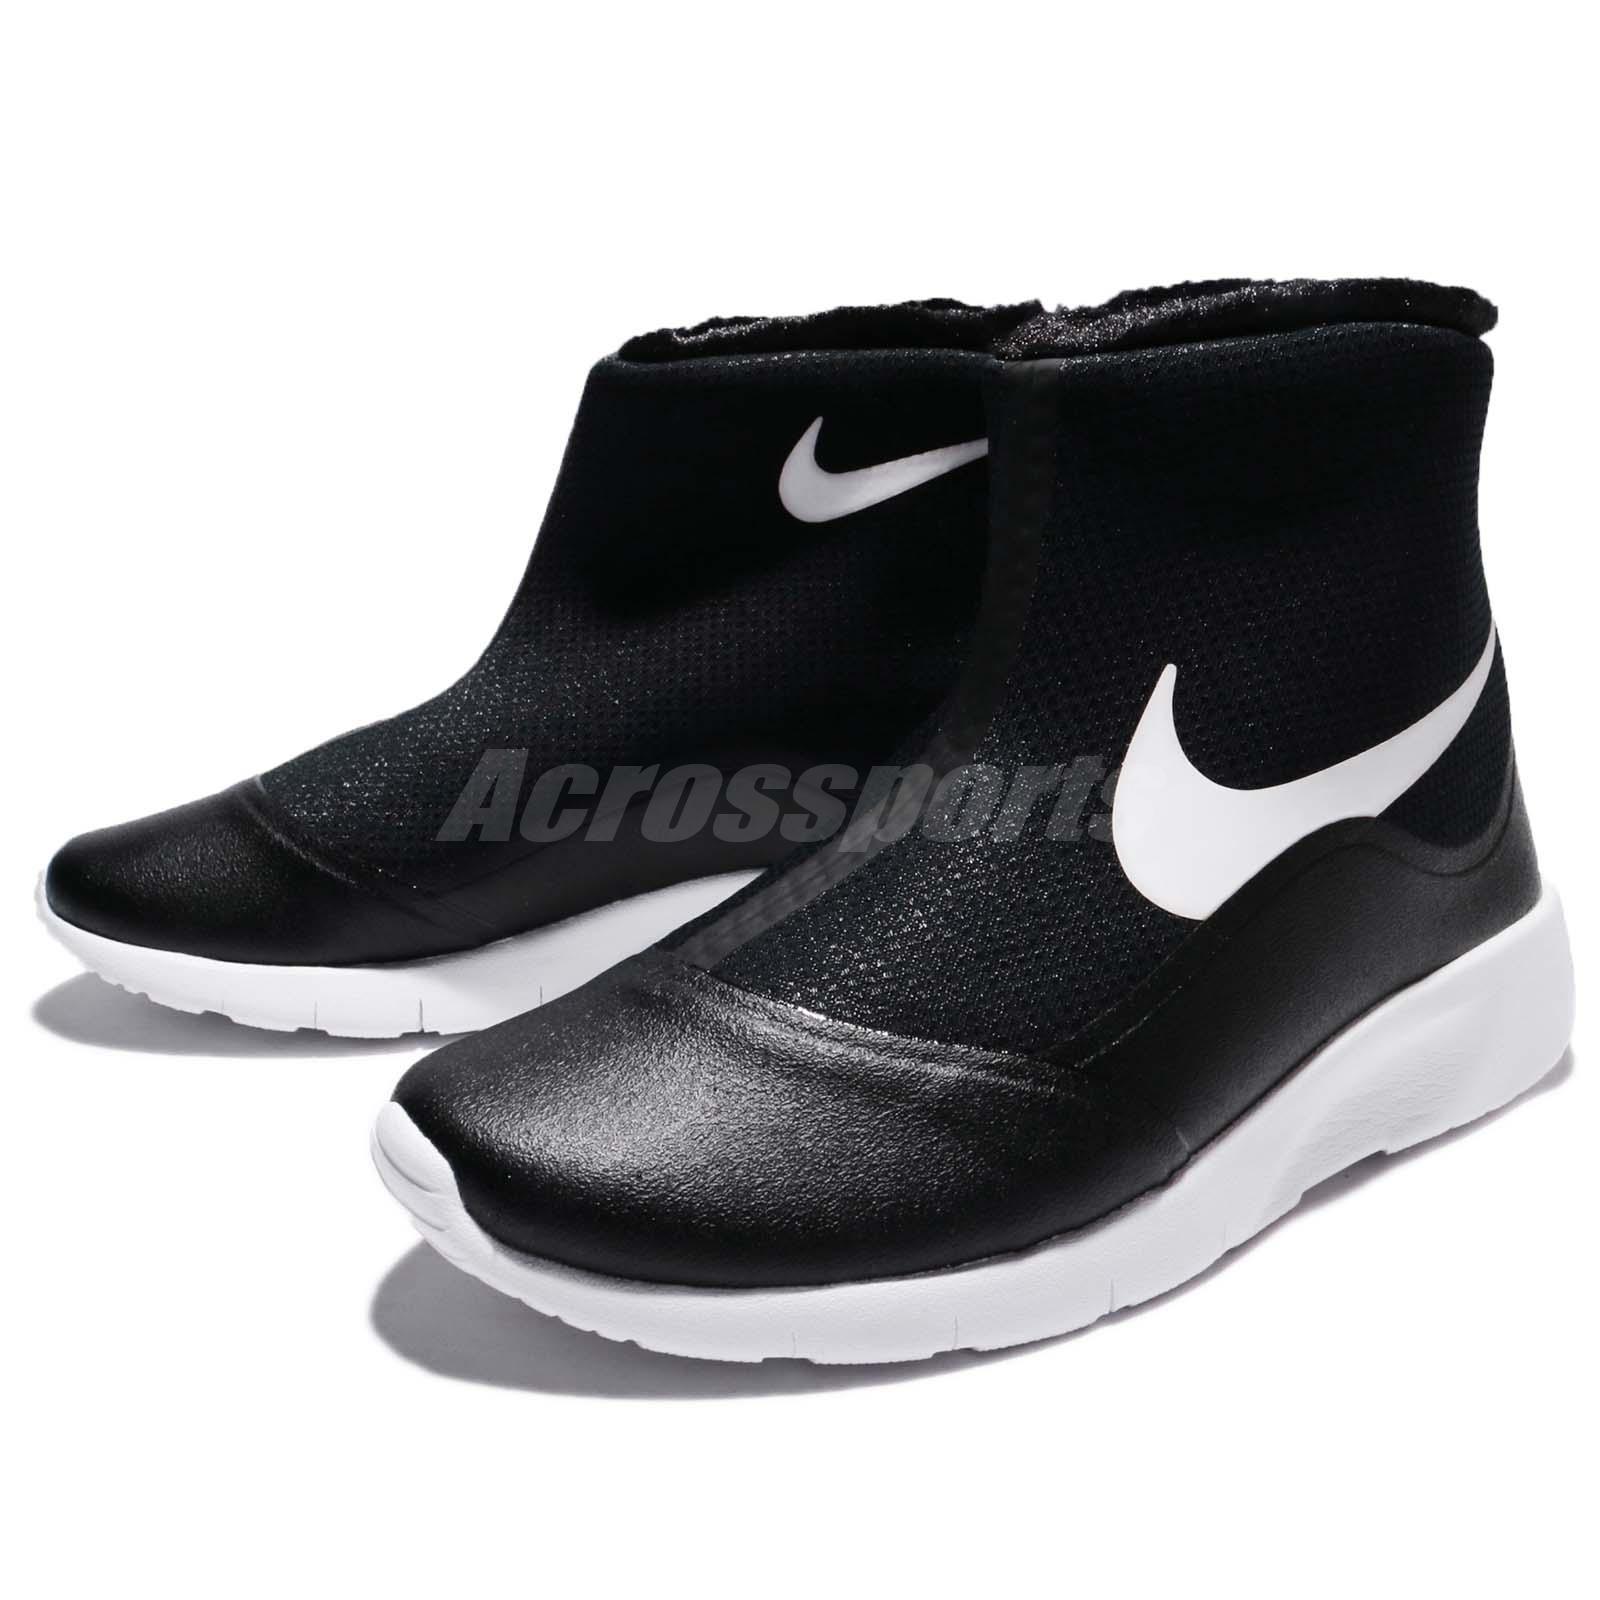 Nike Tanjun Hi Gs High Top Black White Kids Women -8716